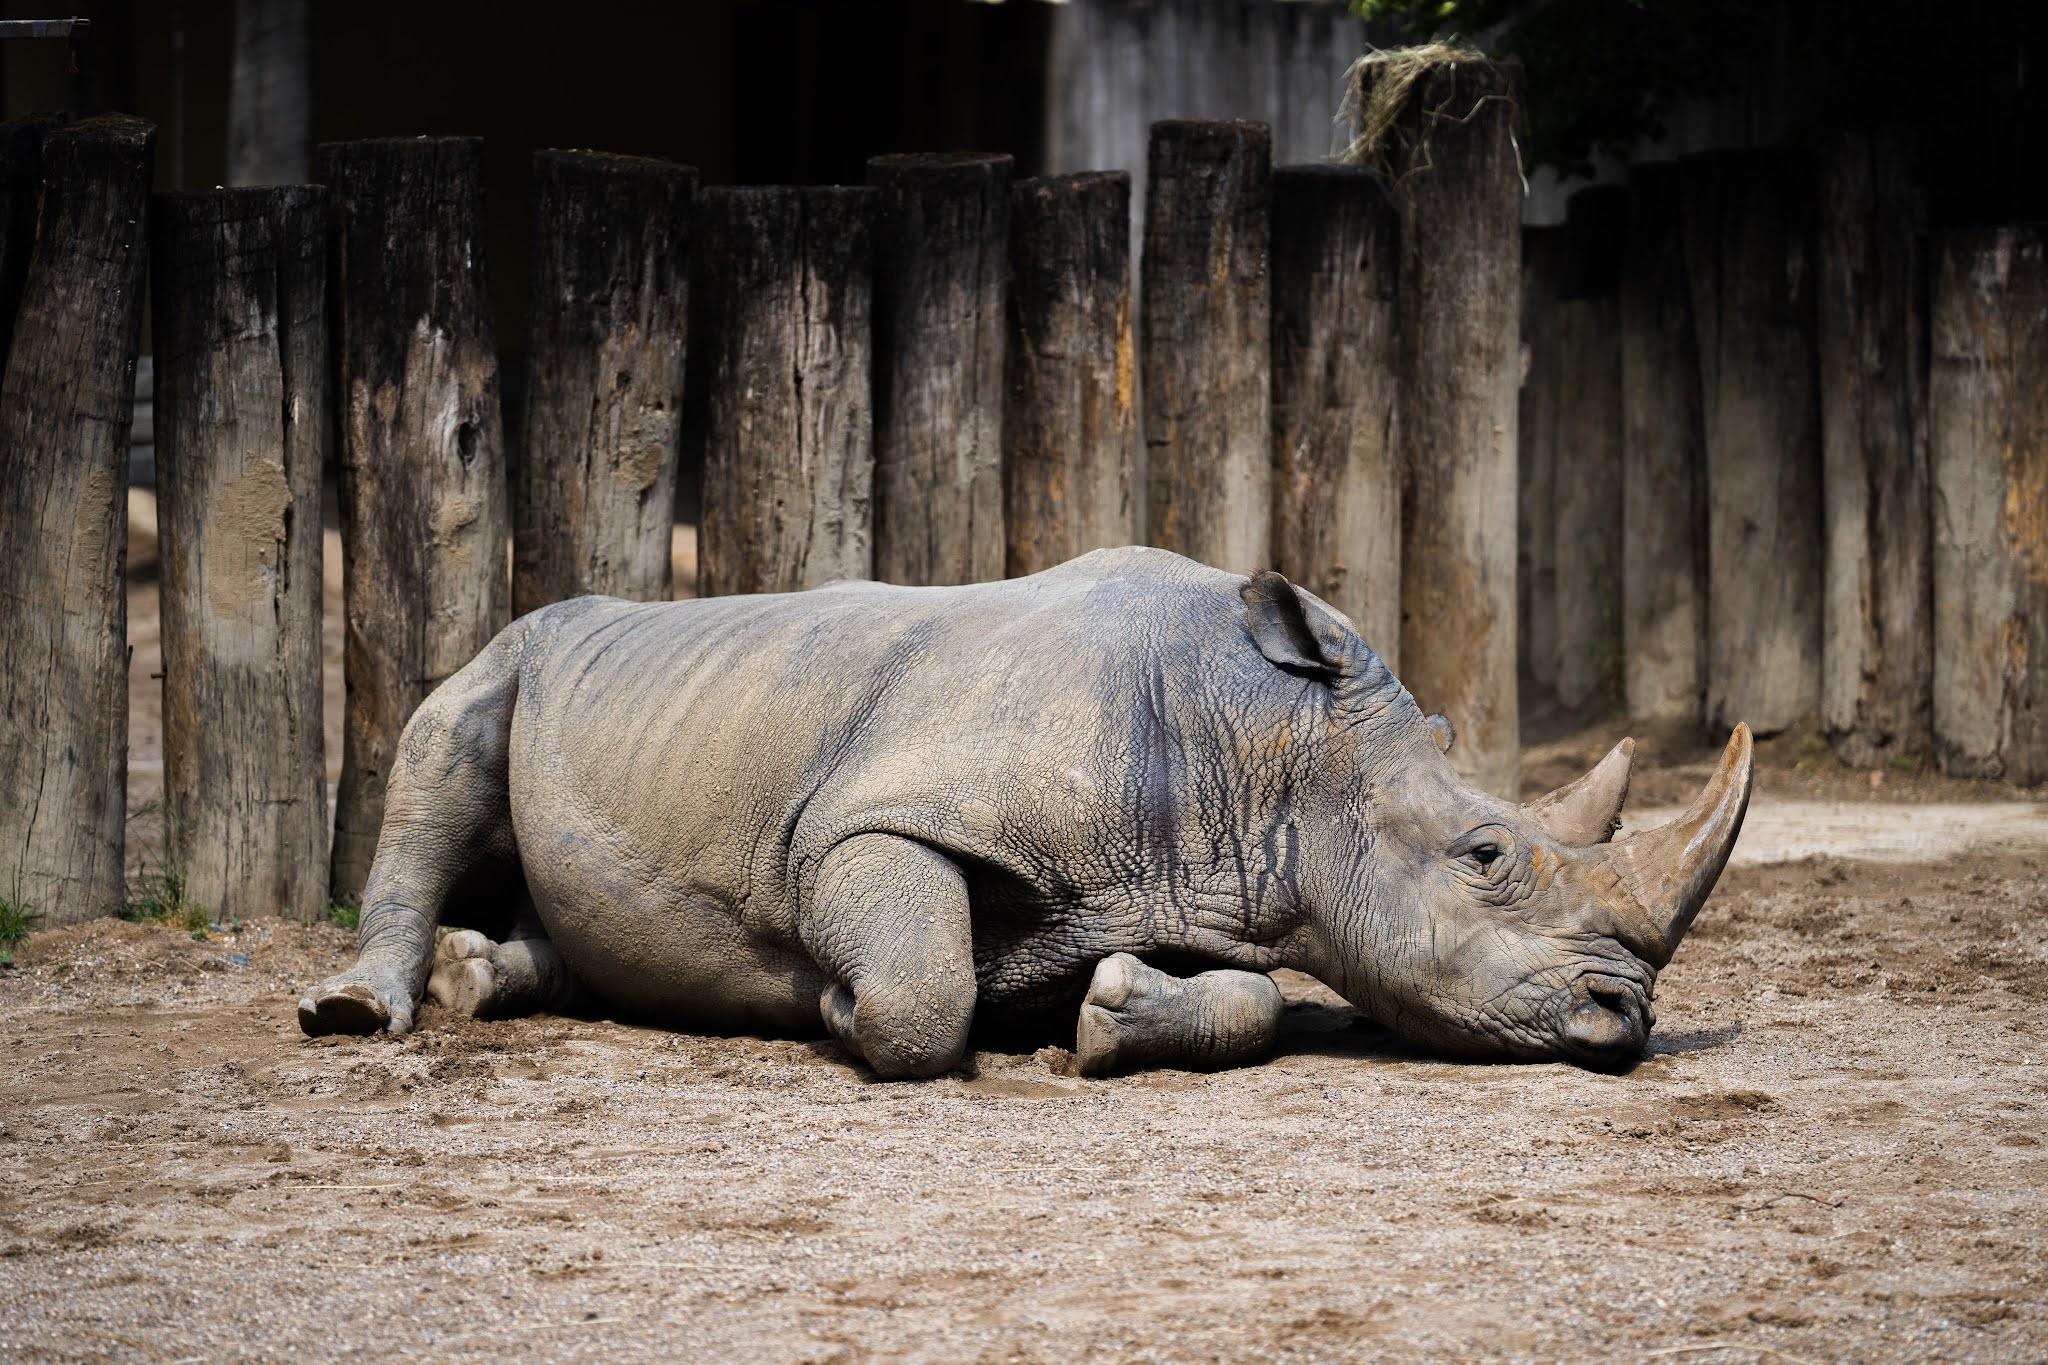 Javan rhinoceros (Badak jawa)